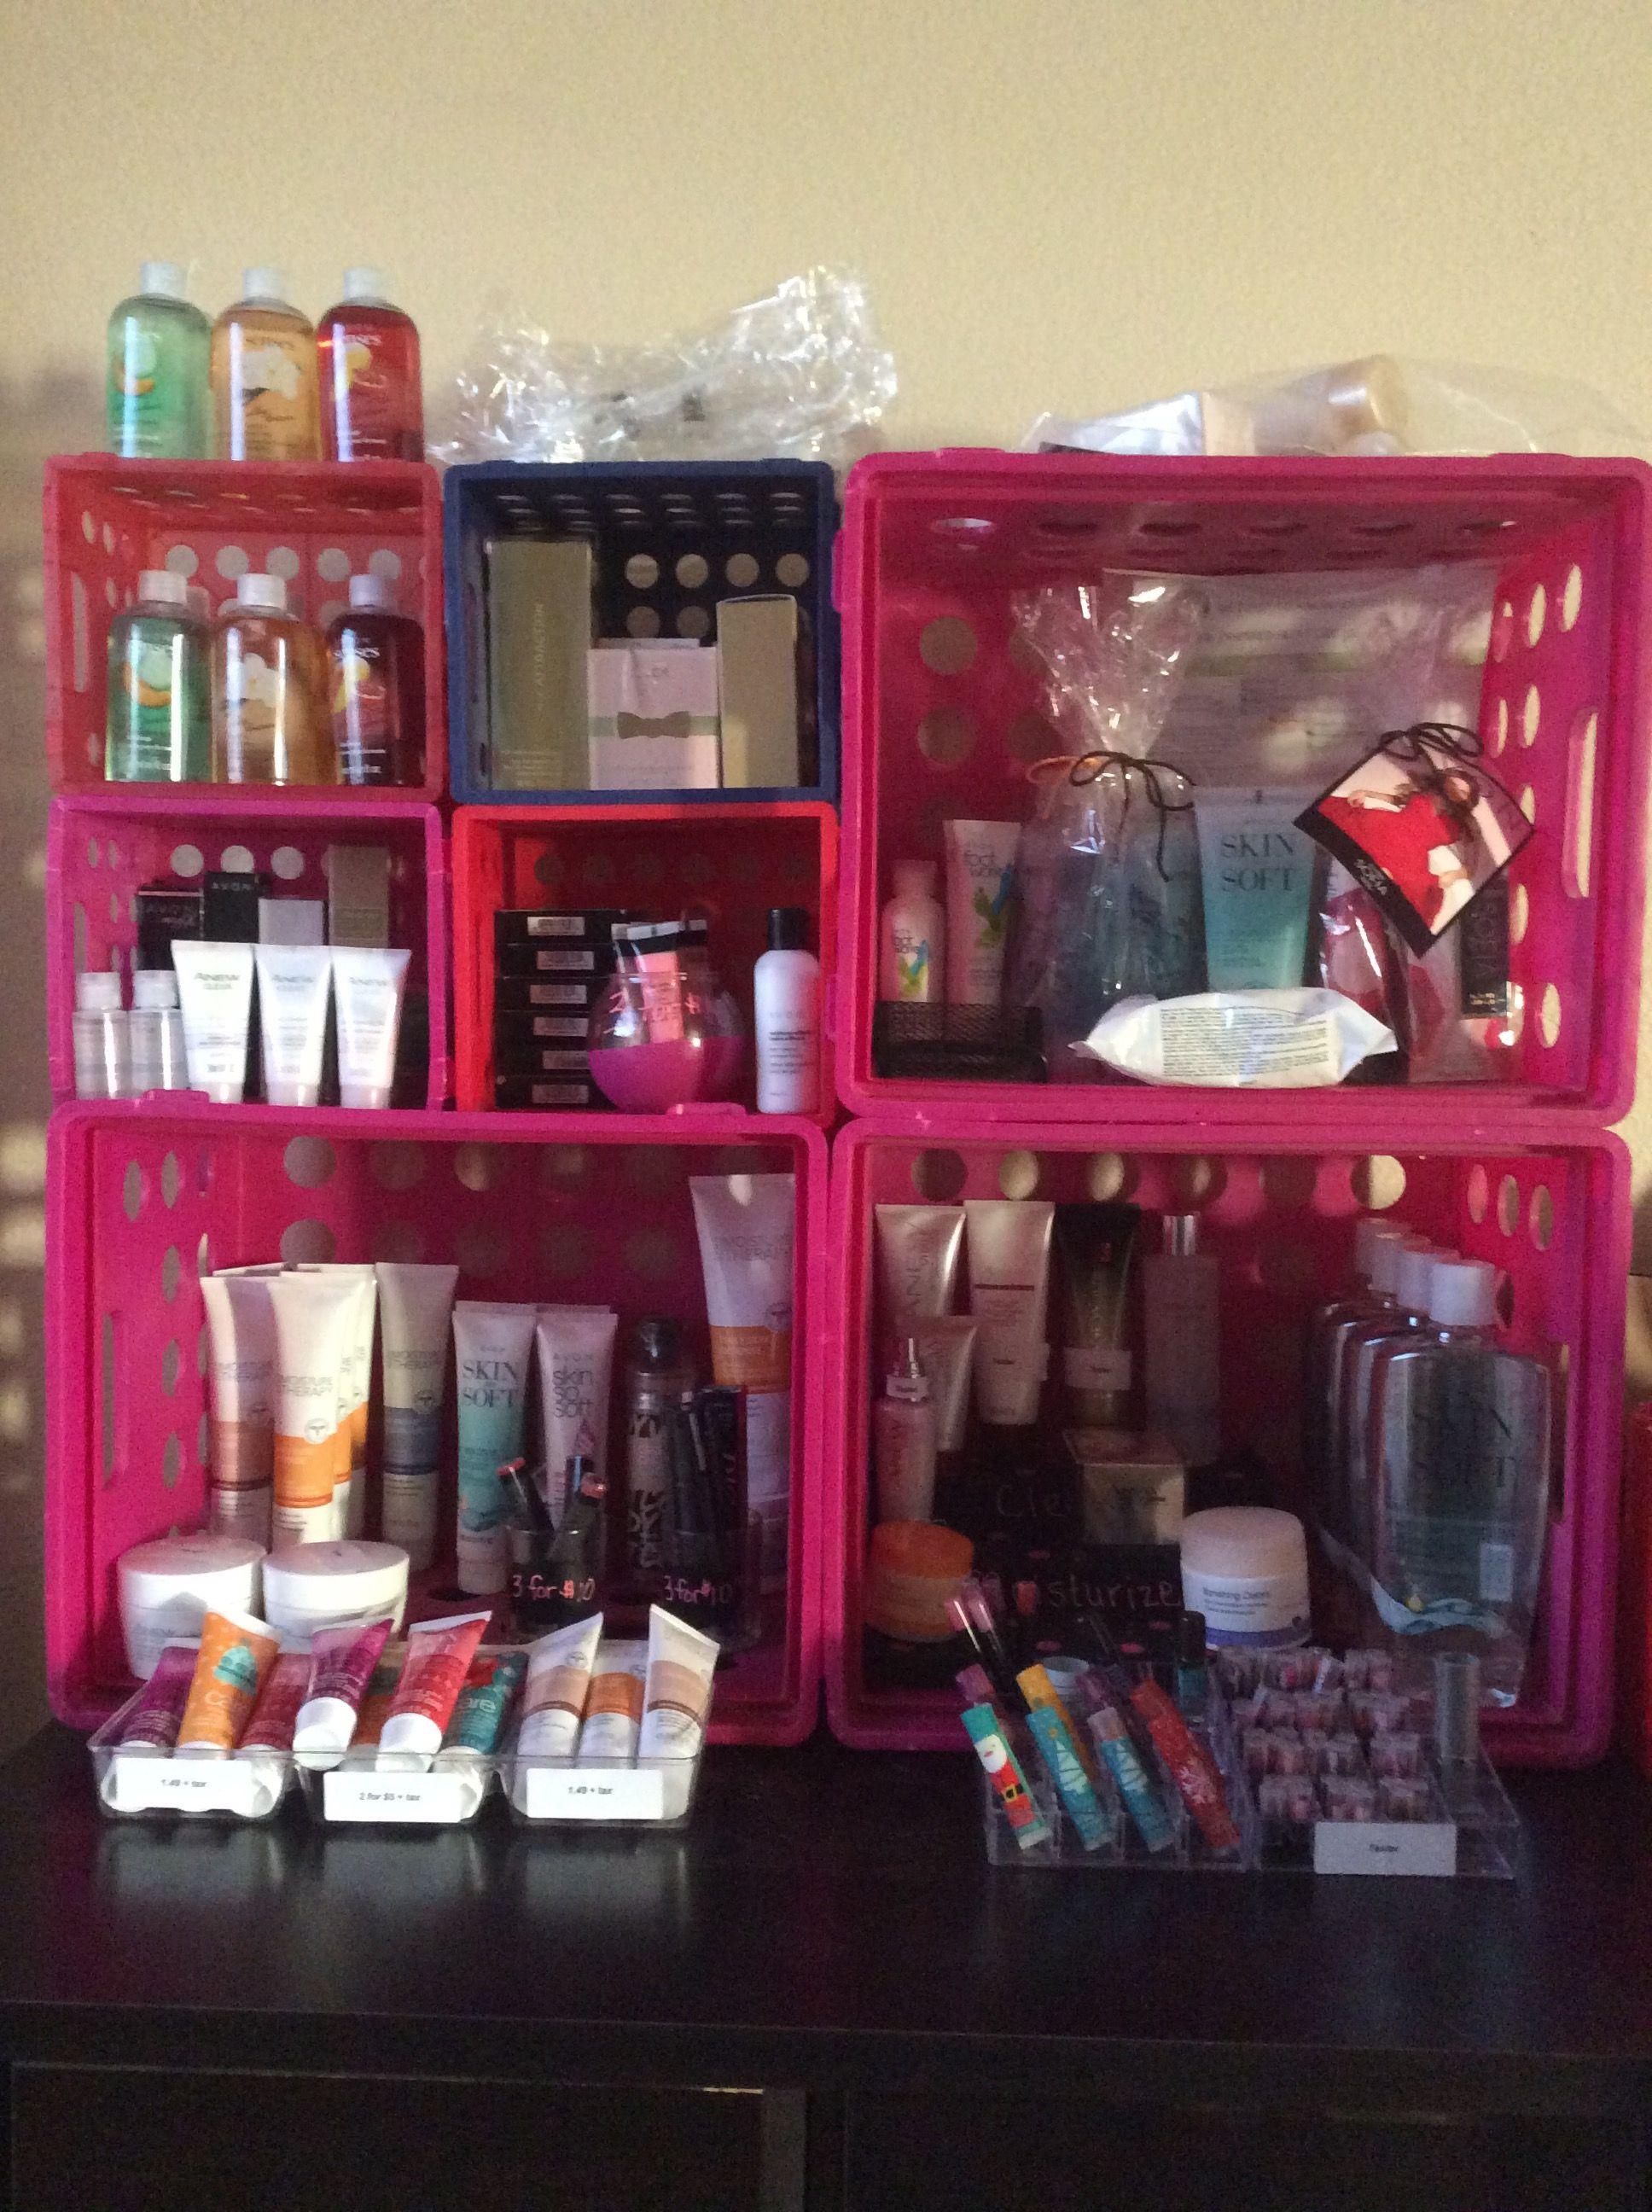 Myavonstore Just A Little Of The Products That I Have On Hand Www Youravon Com Christelsilva Avonlady Empoweri Avon Gift Baskets Avon Display Avon Business